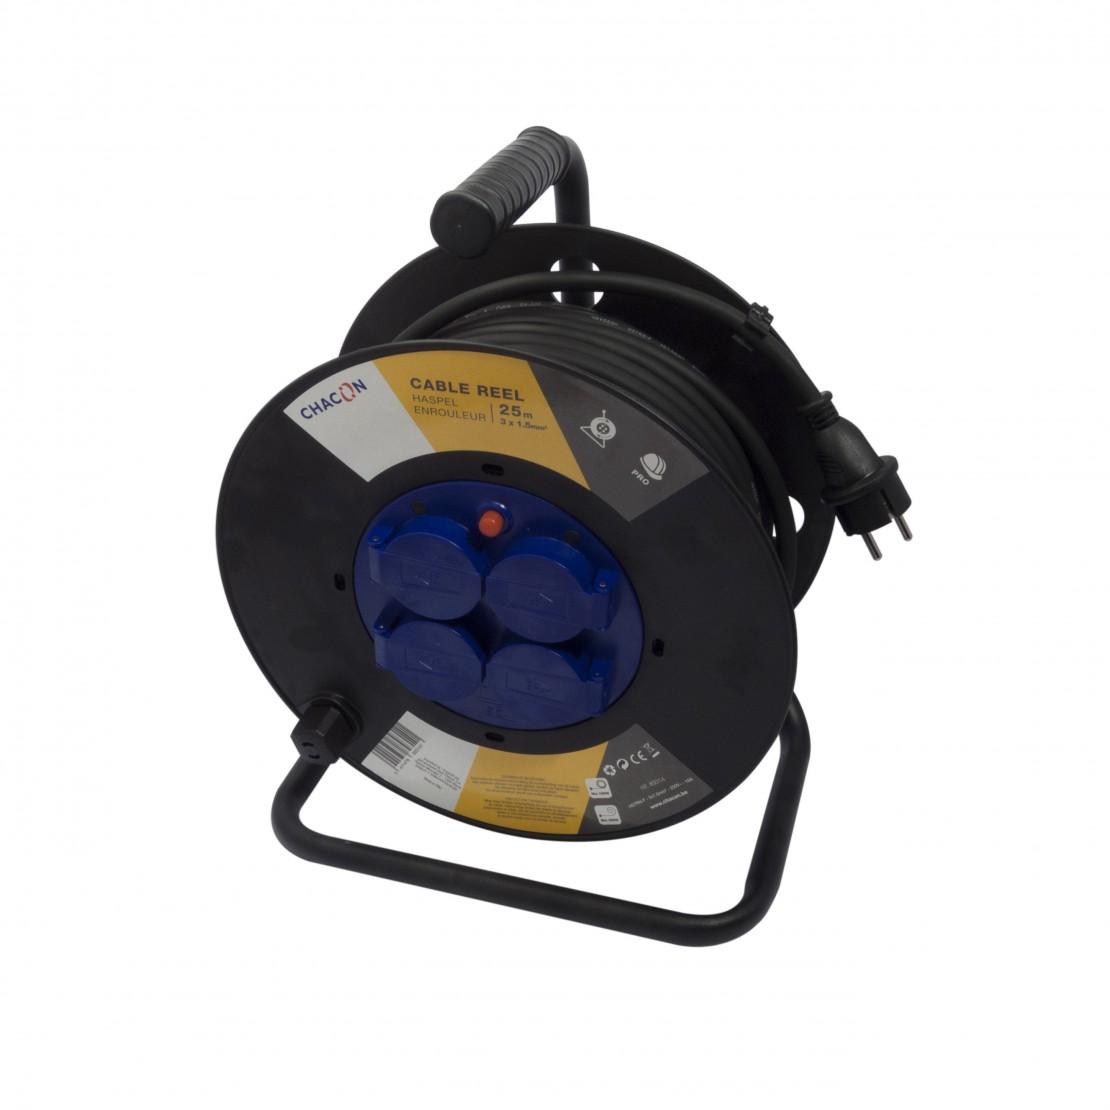 Enrouleur 4x16A HO7RN-F 3 x 1, 5mm² - 25 m (SCH)